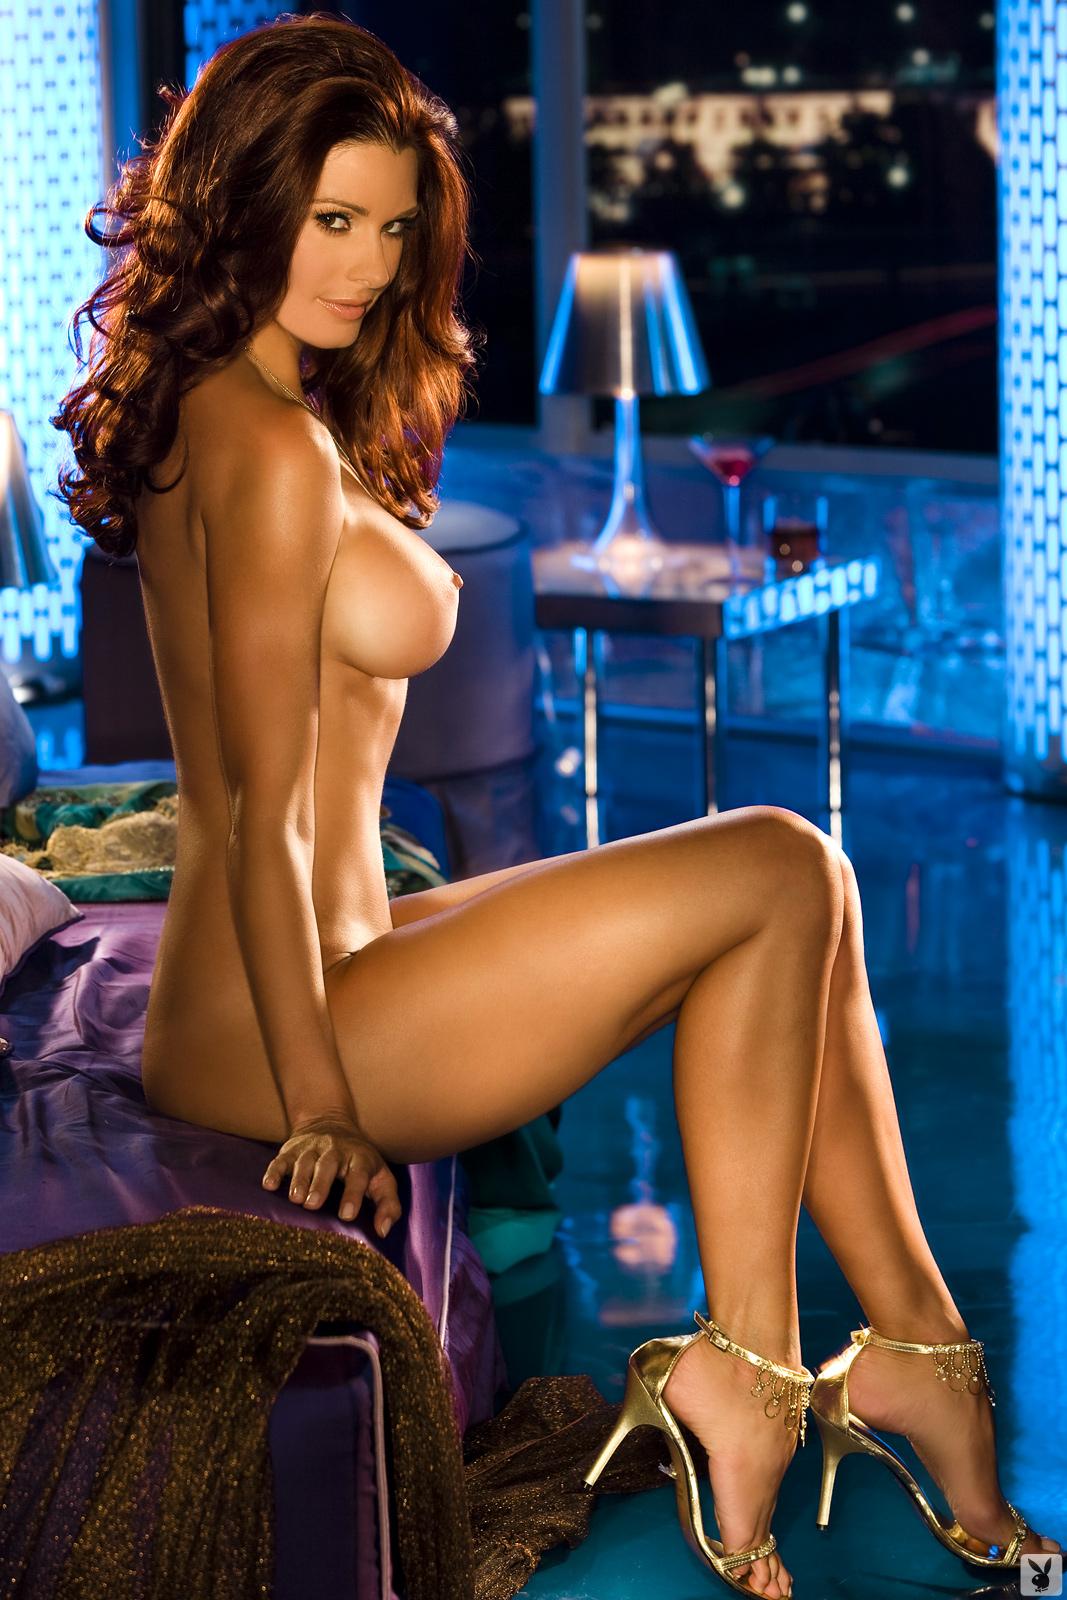 ftv midnight hot nude pics